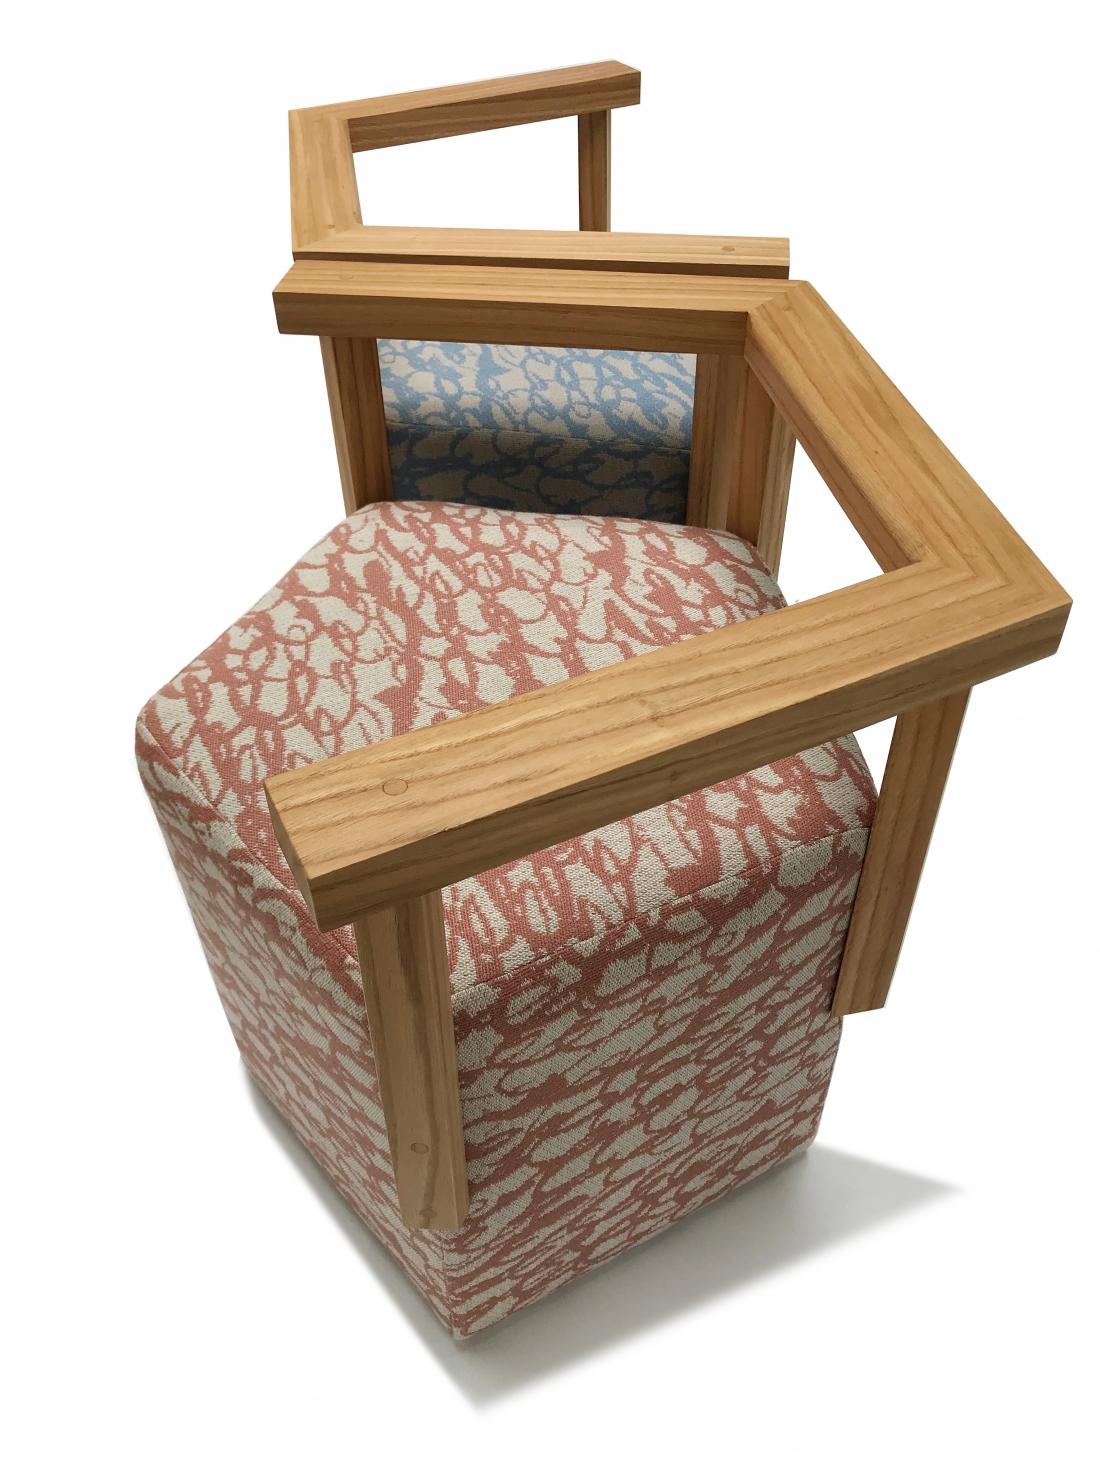 Image by Ella Doran - Julian Mayor Pentagon Chairs kissing